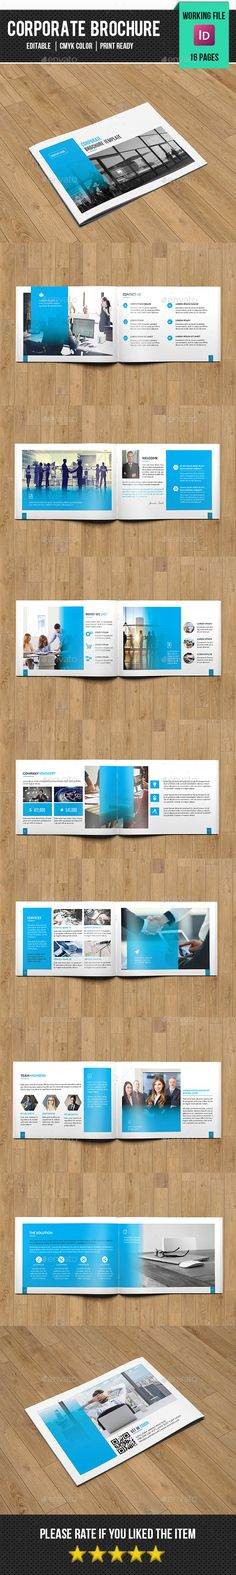 Clean Corporate Brochure/Catalog on Behance